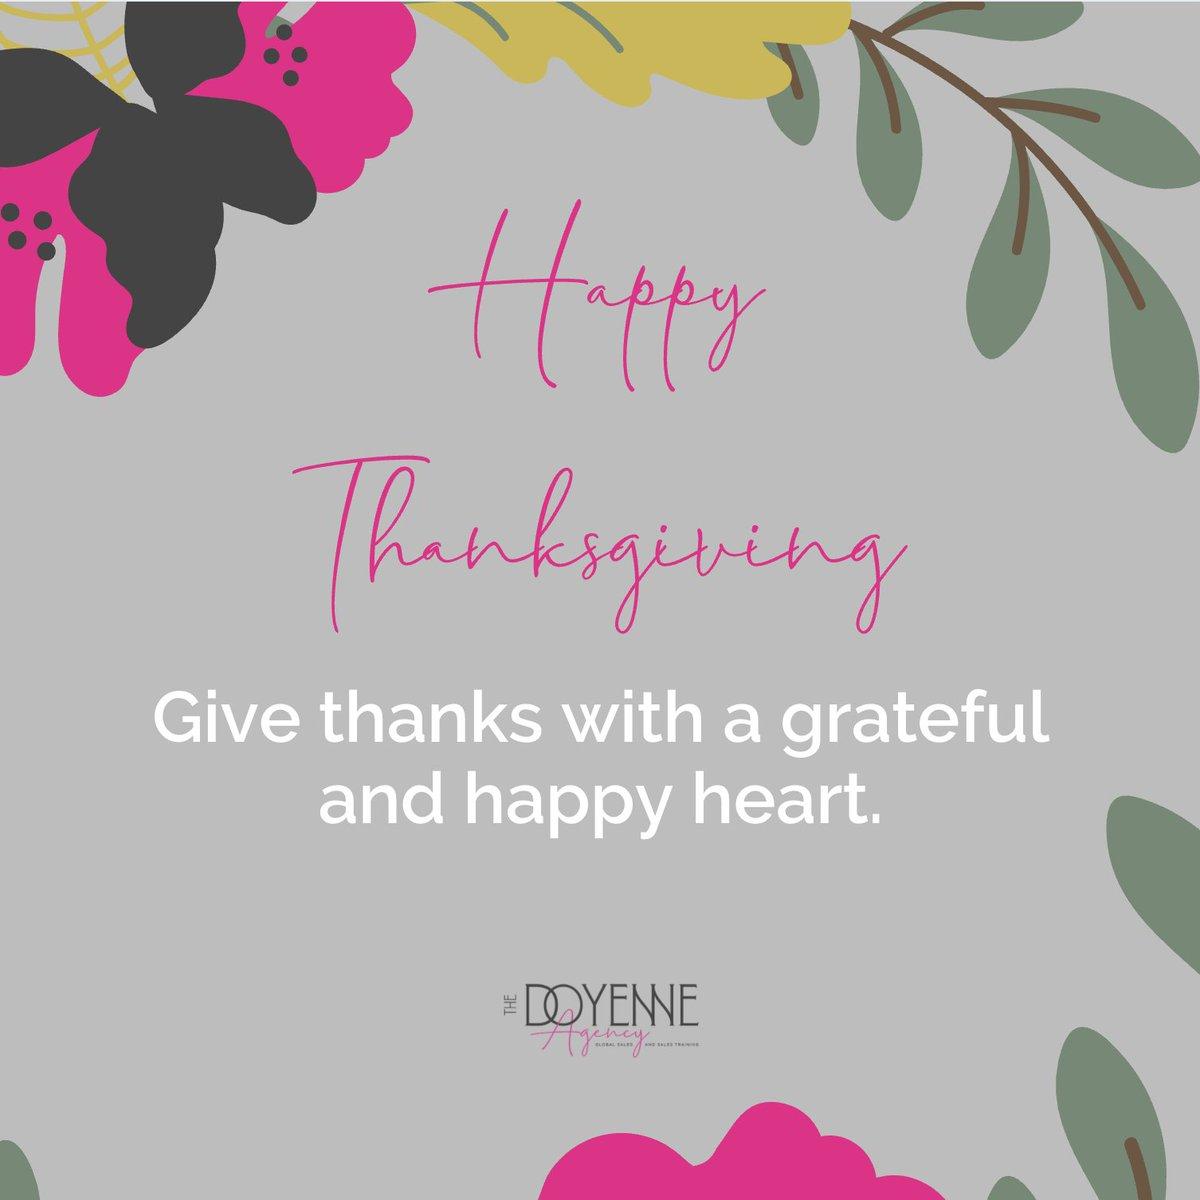 Happy Thanksgiving! #thanksgiving #givethanks #grateful #gratitude #thanksgivingday #gobble #family #love #joy #happythanksgiving